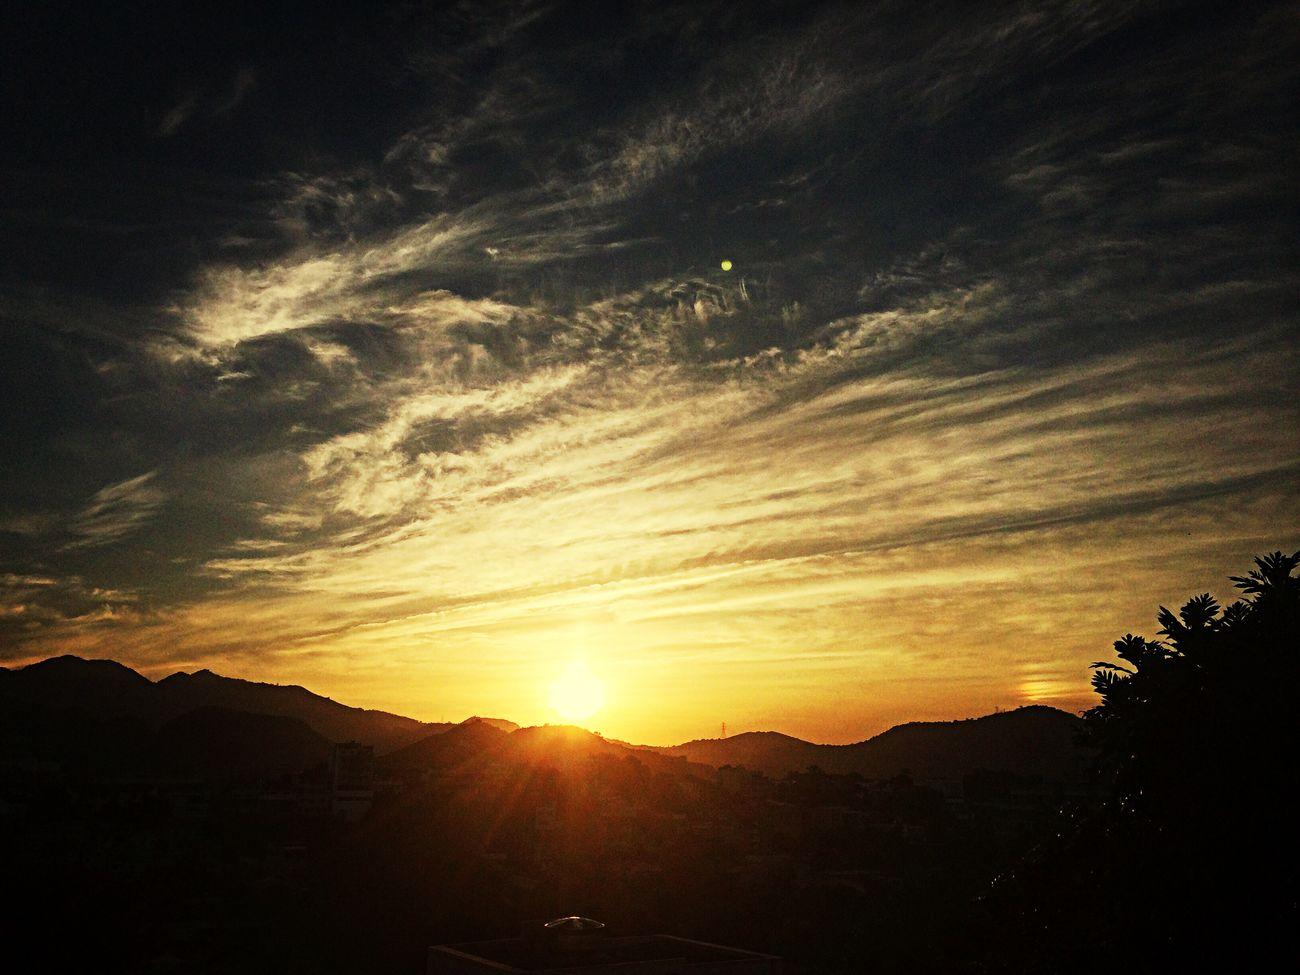 #VidaQueSegue #ARodaGira #Simbora http://youtu.be/9wHonAkXfuQ #StoryOfMyLife Sky Clouds Sky_collection Sunset